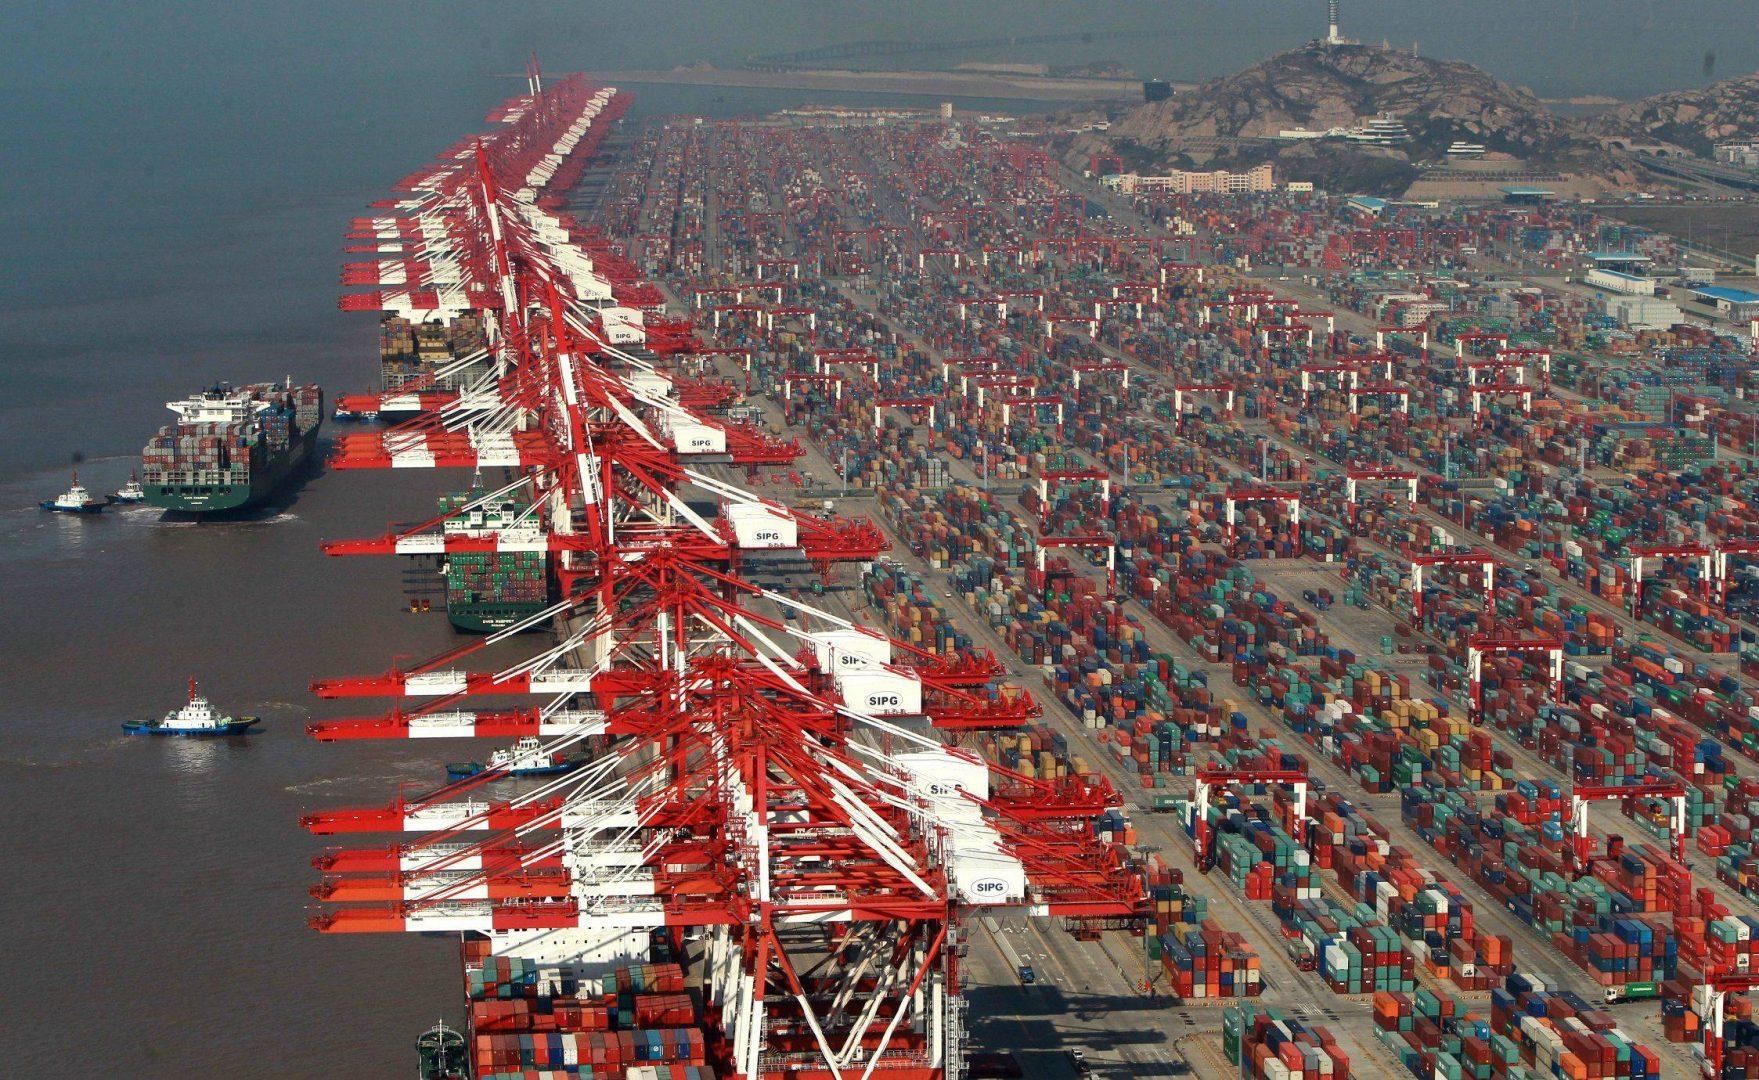 Exports from China surged 21% in November